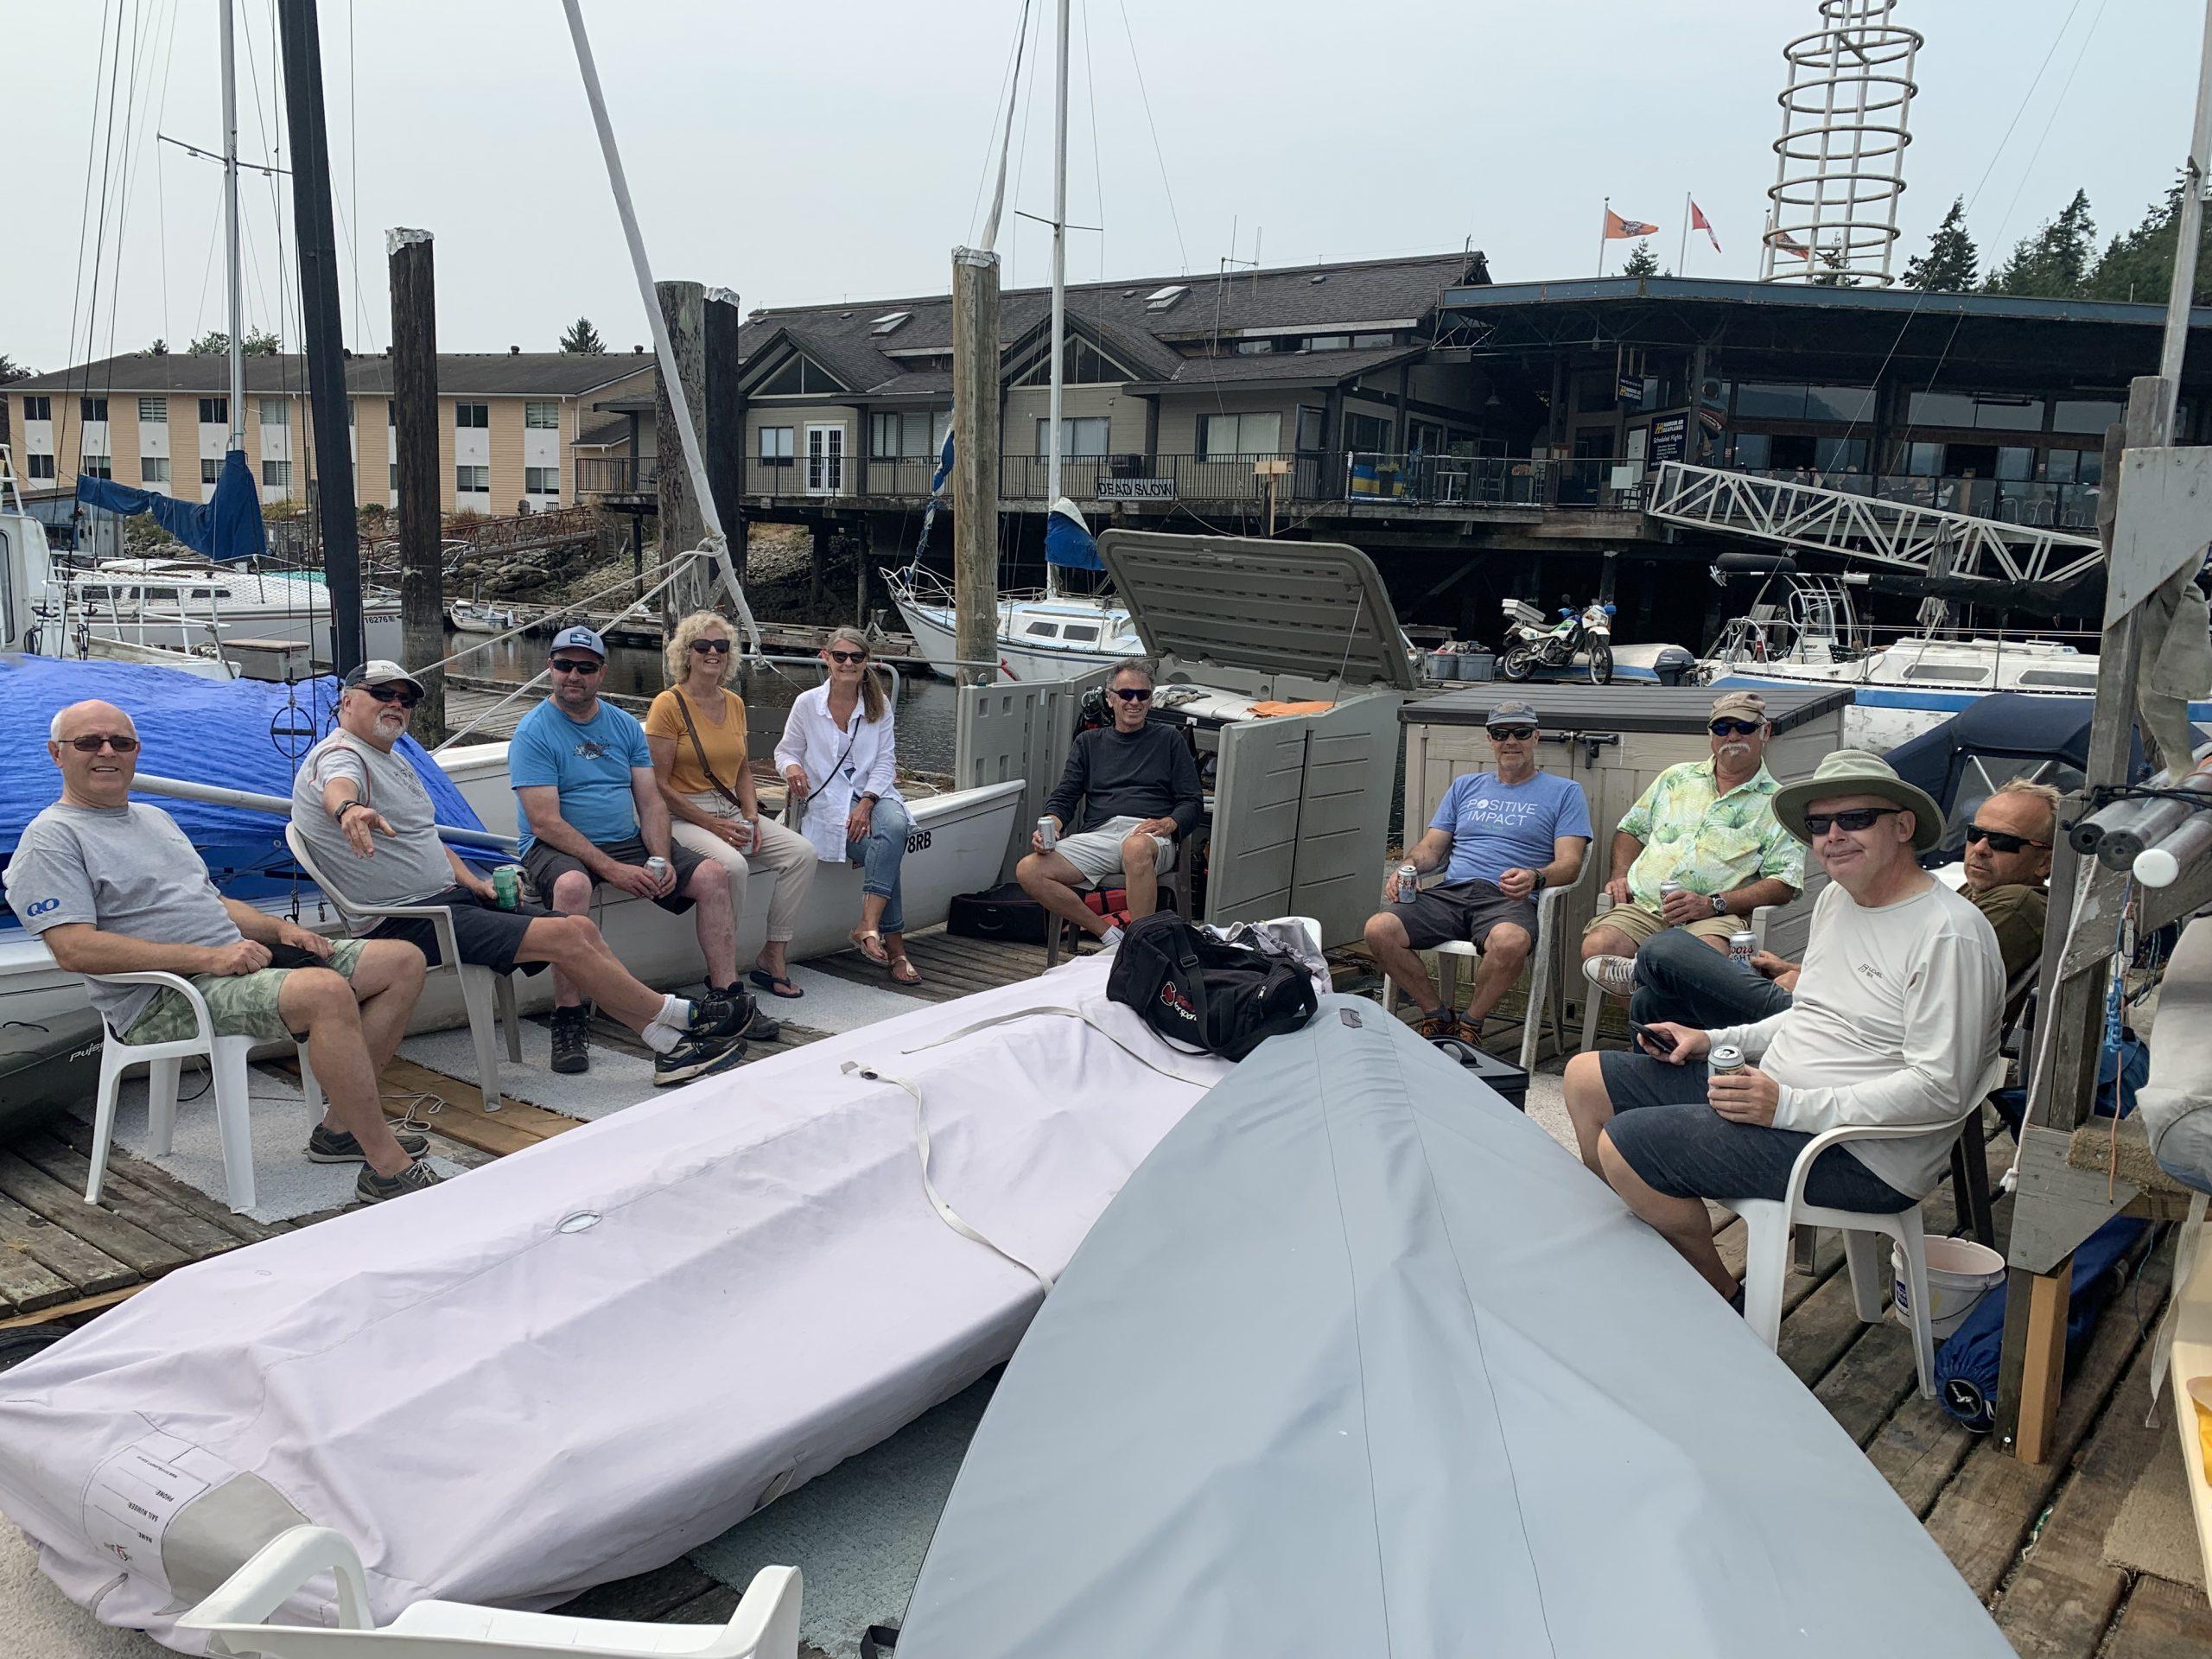 Members of the Laser Sailing Club